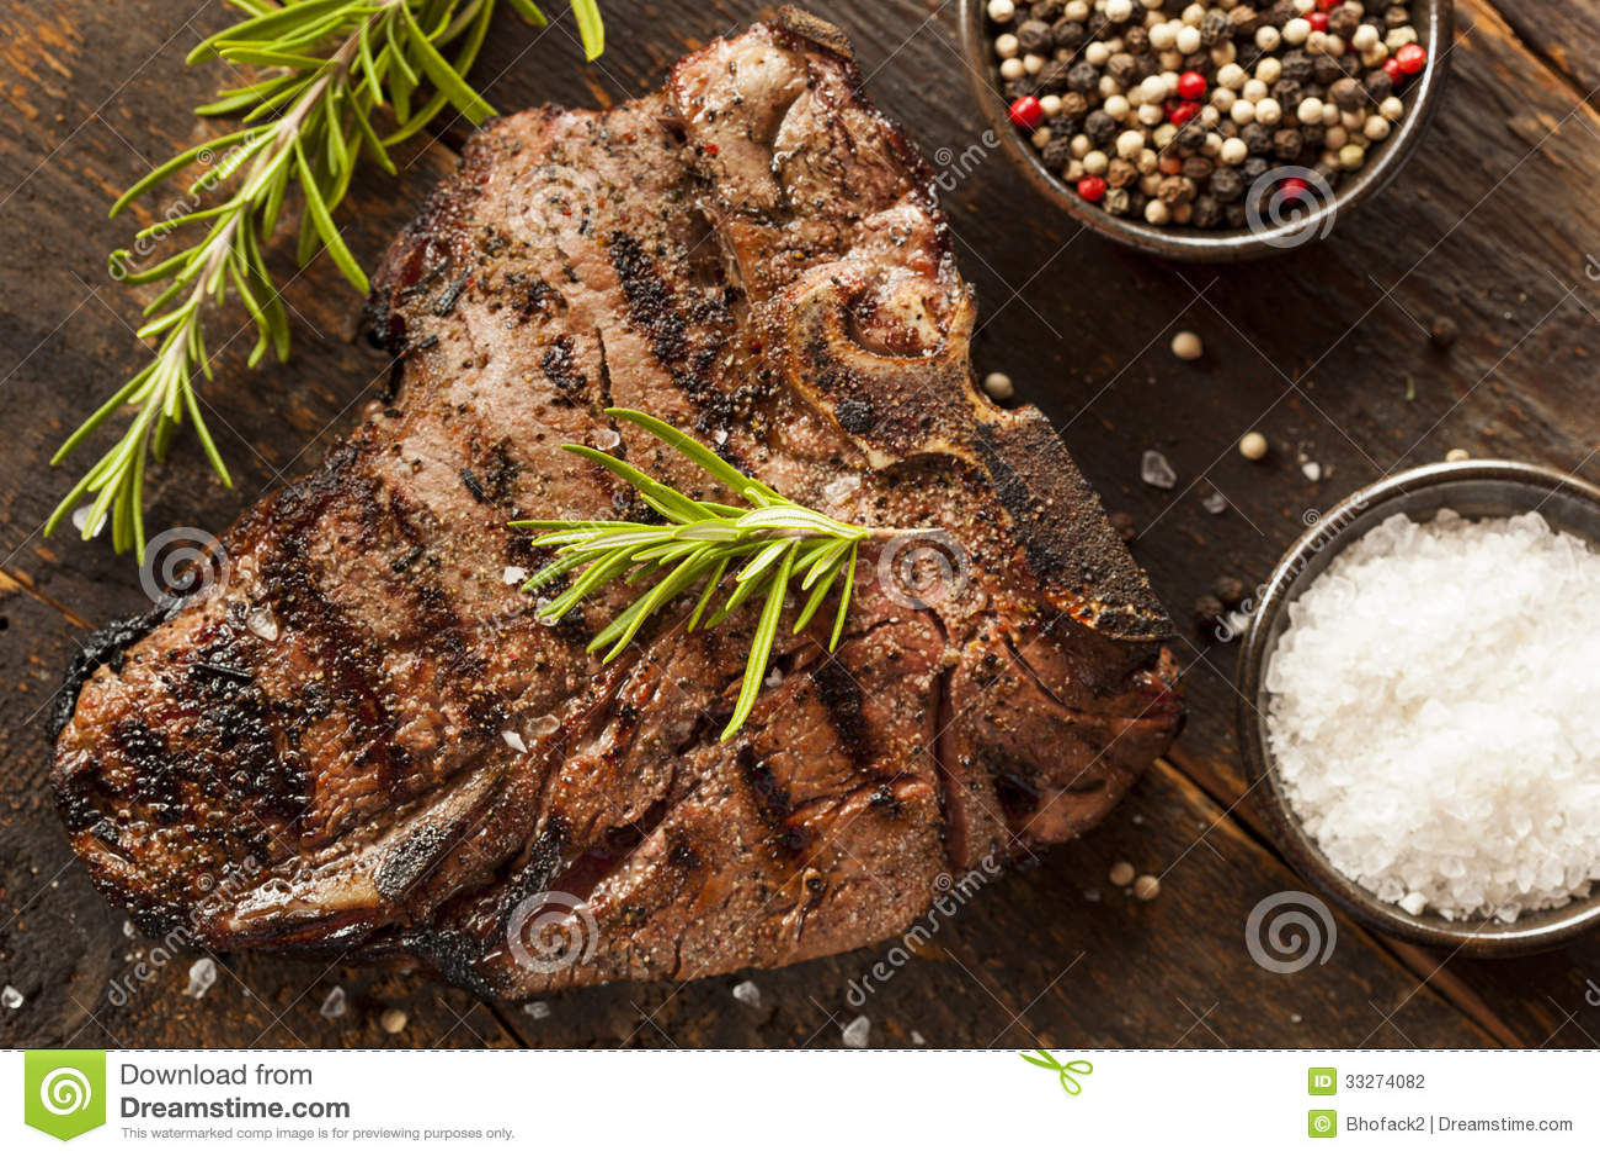 how to prepare steak on bbq